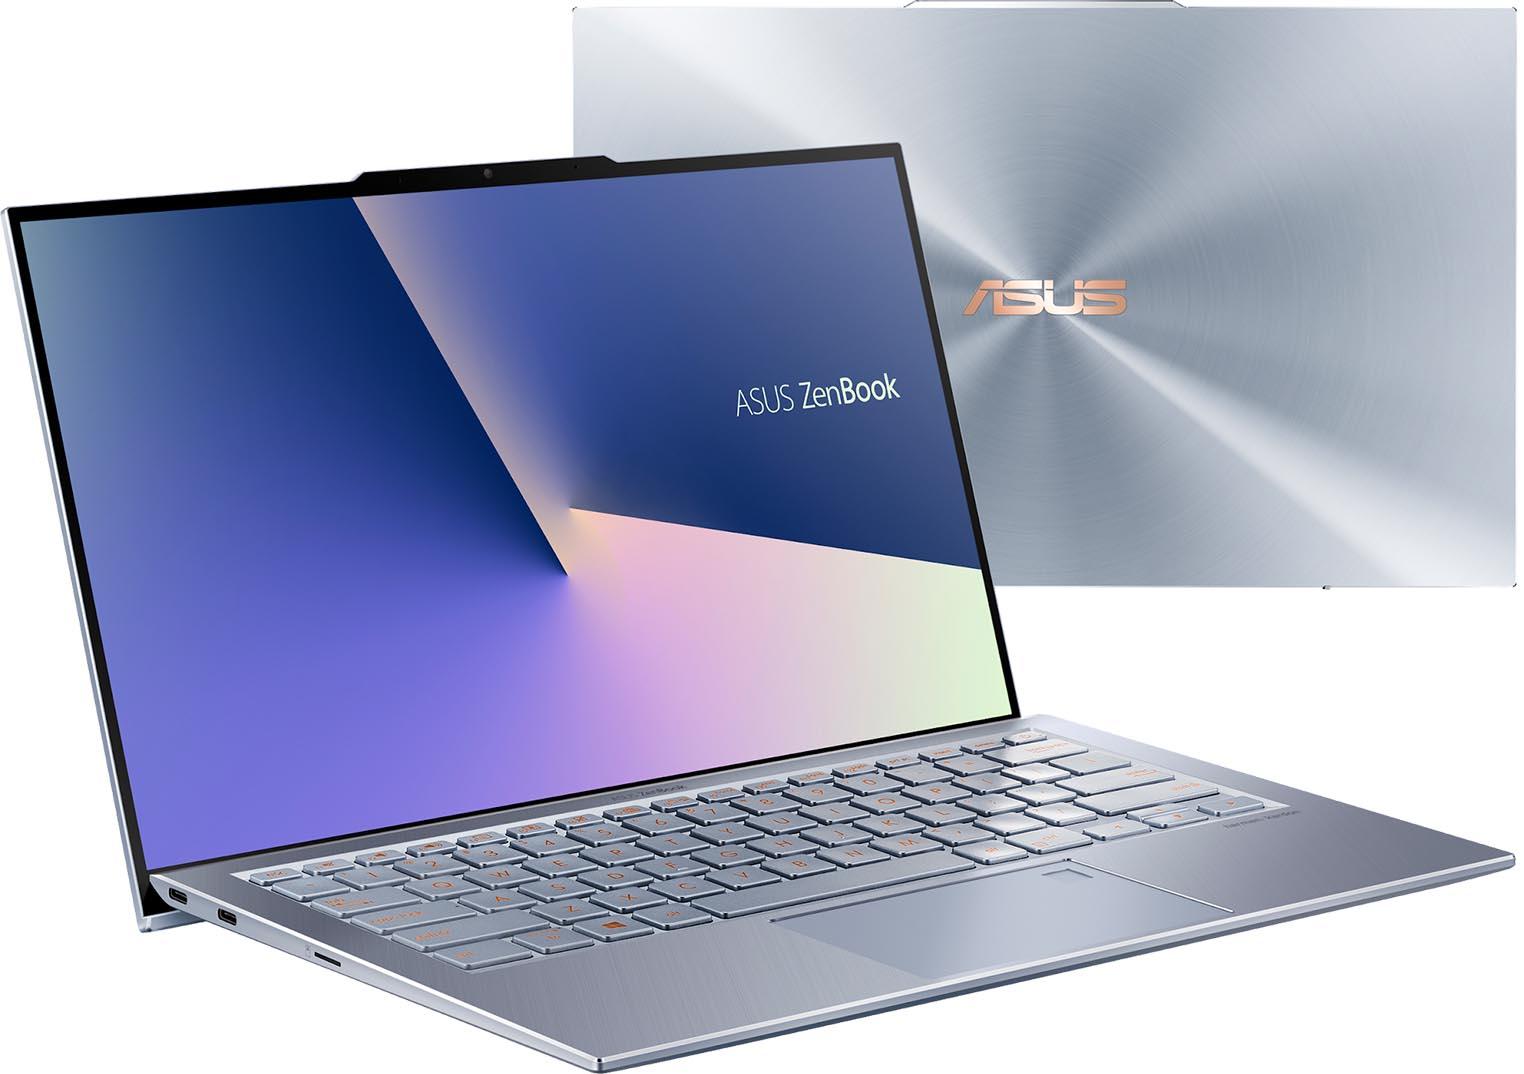 Asus ZenBook S13 encoche